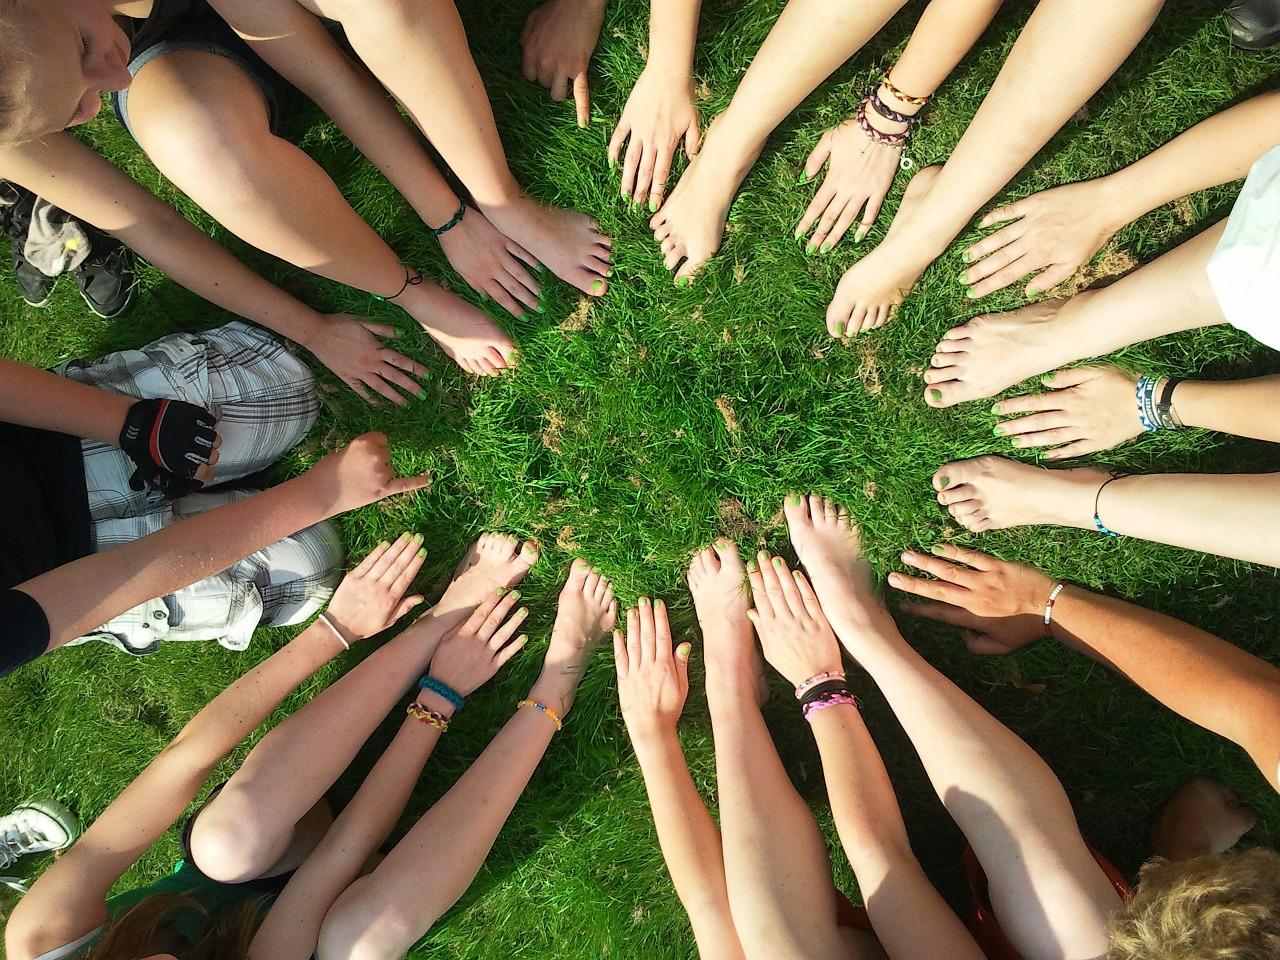 Team_hands_and_feet